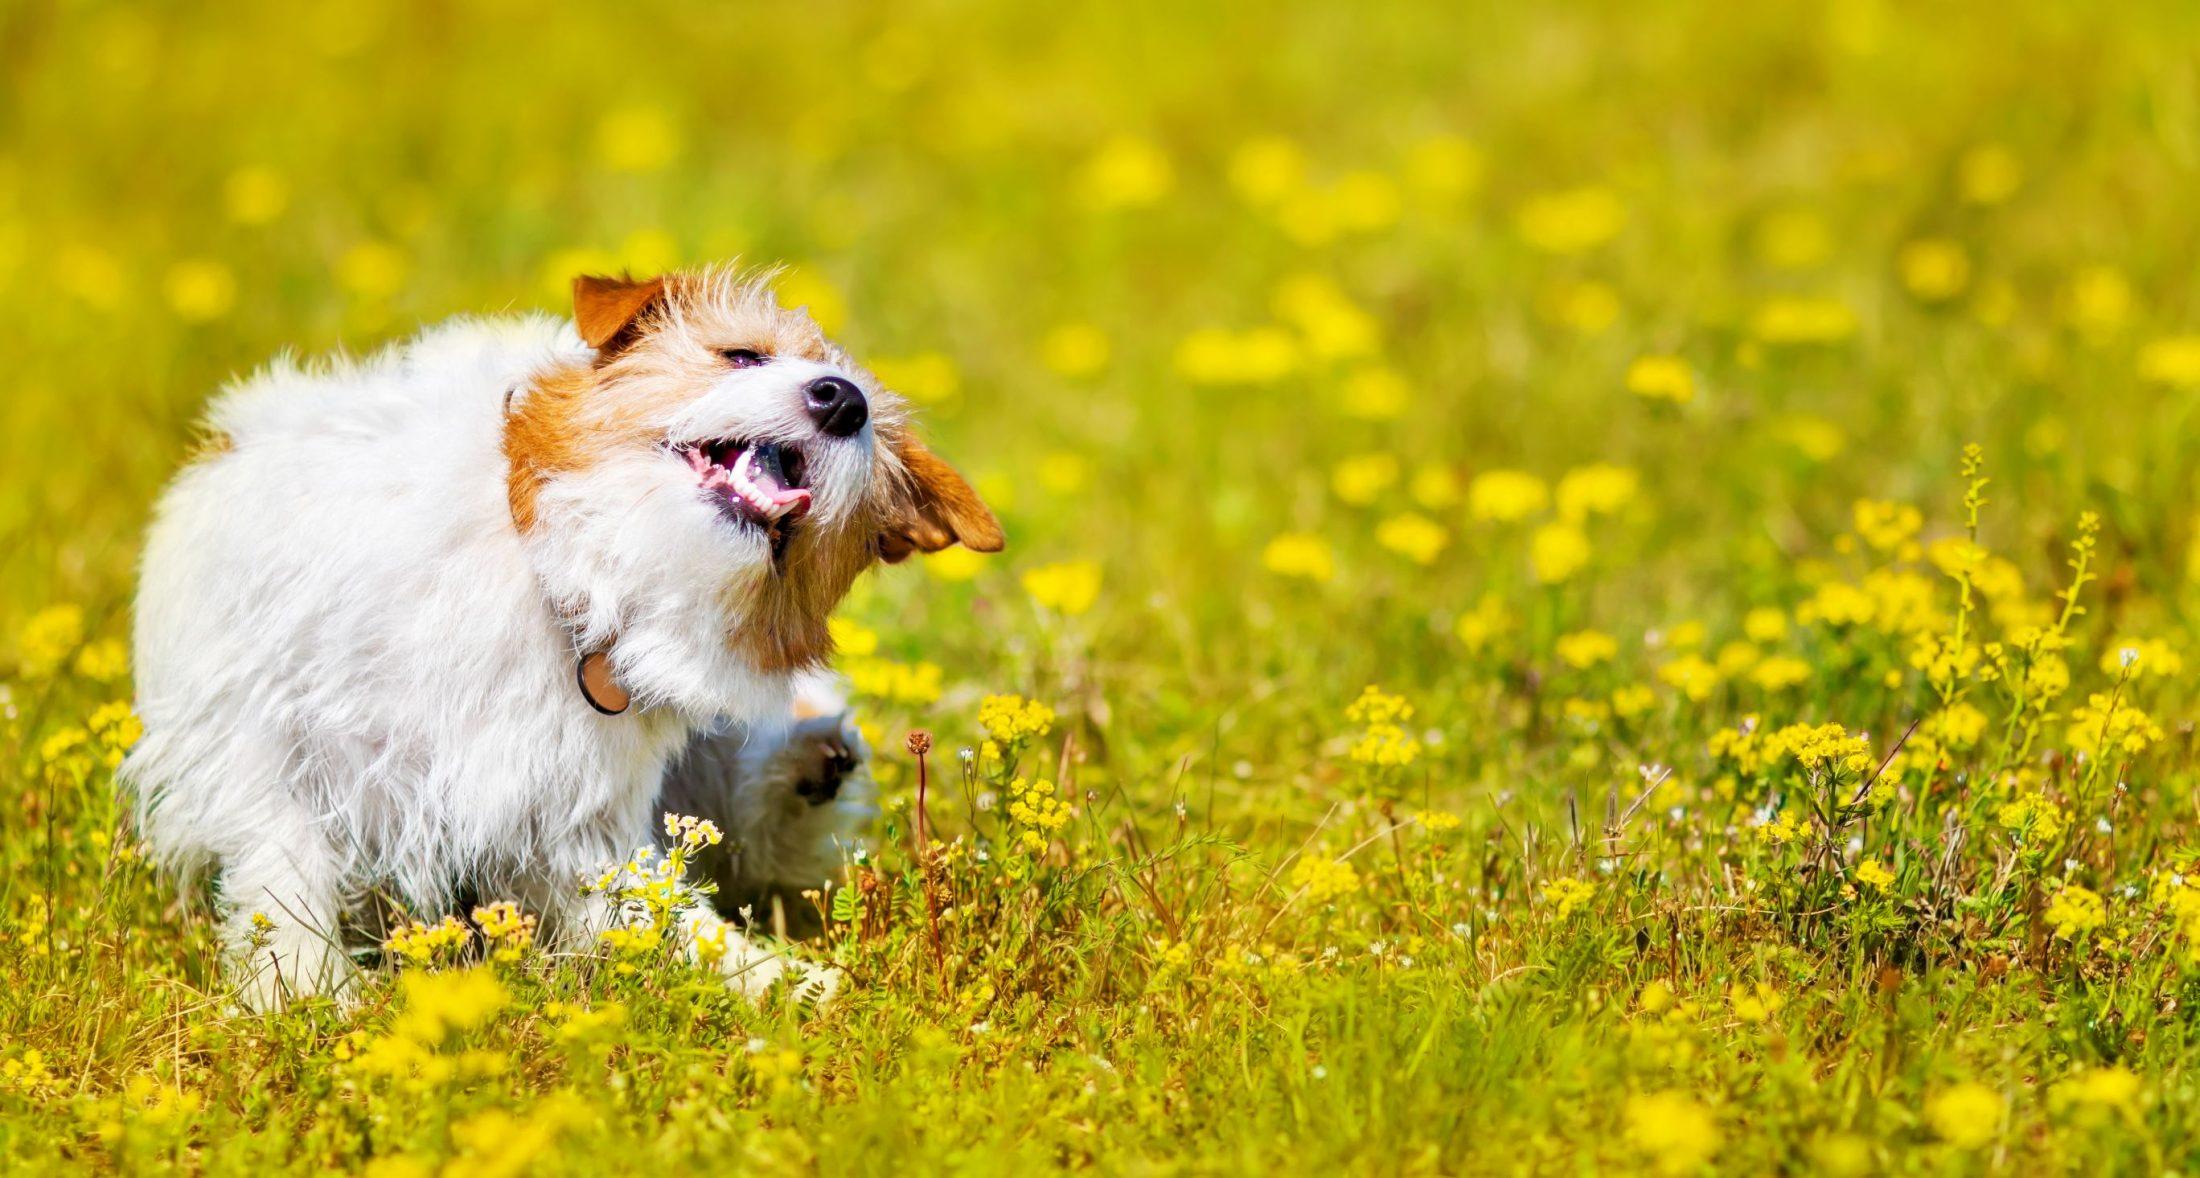 pet dog itching itself.